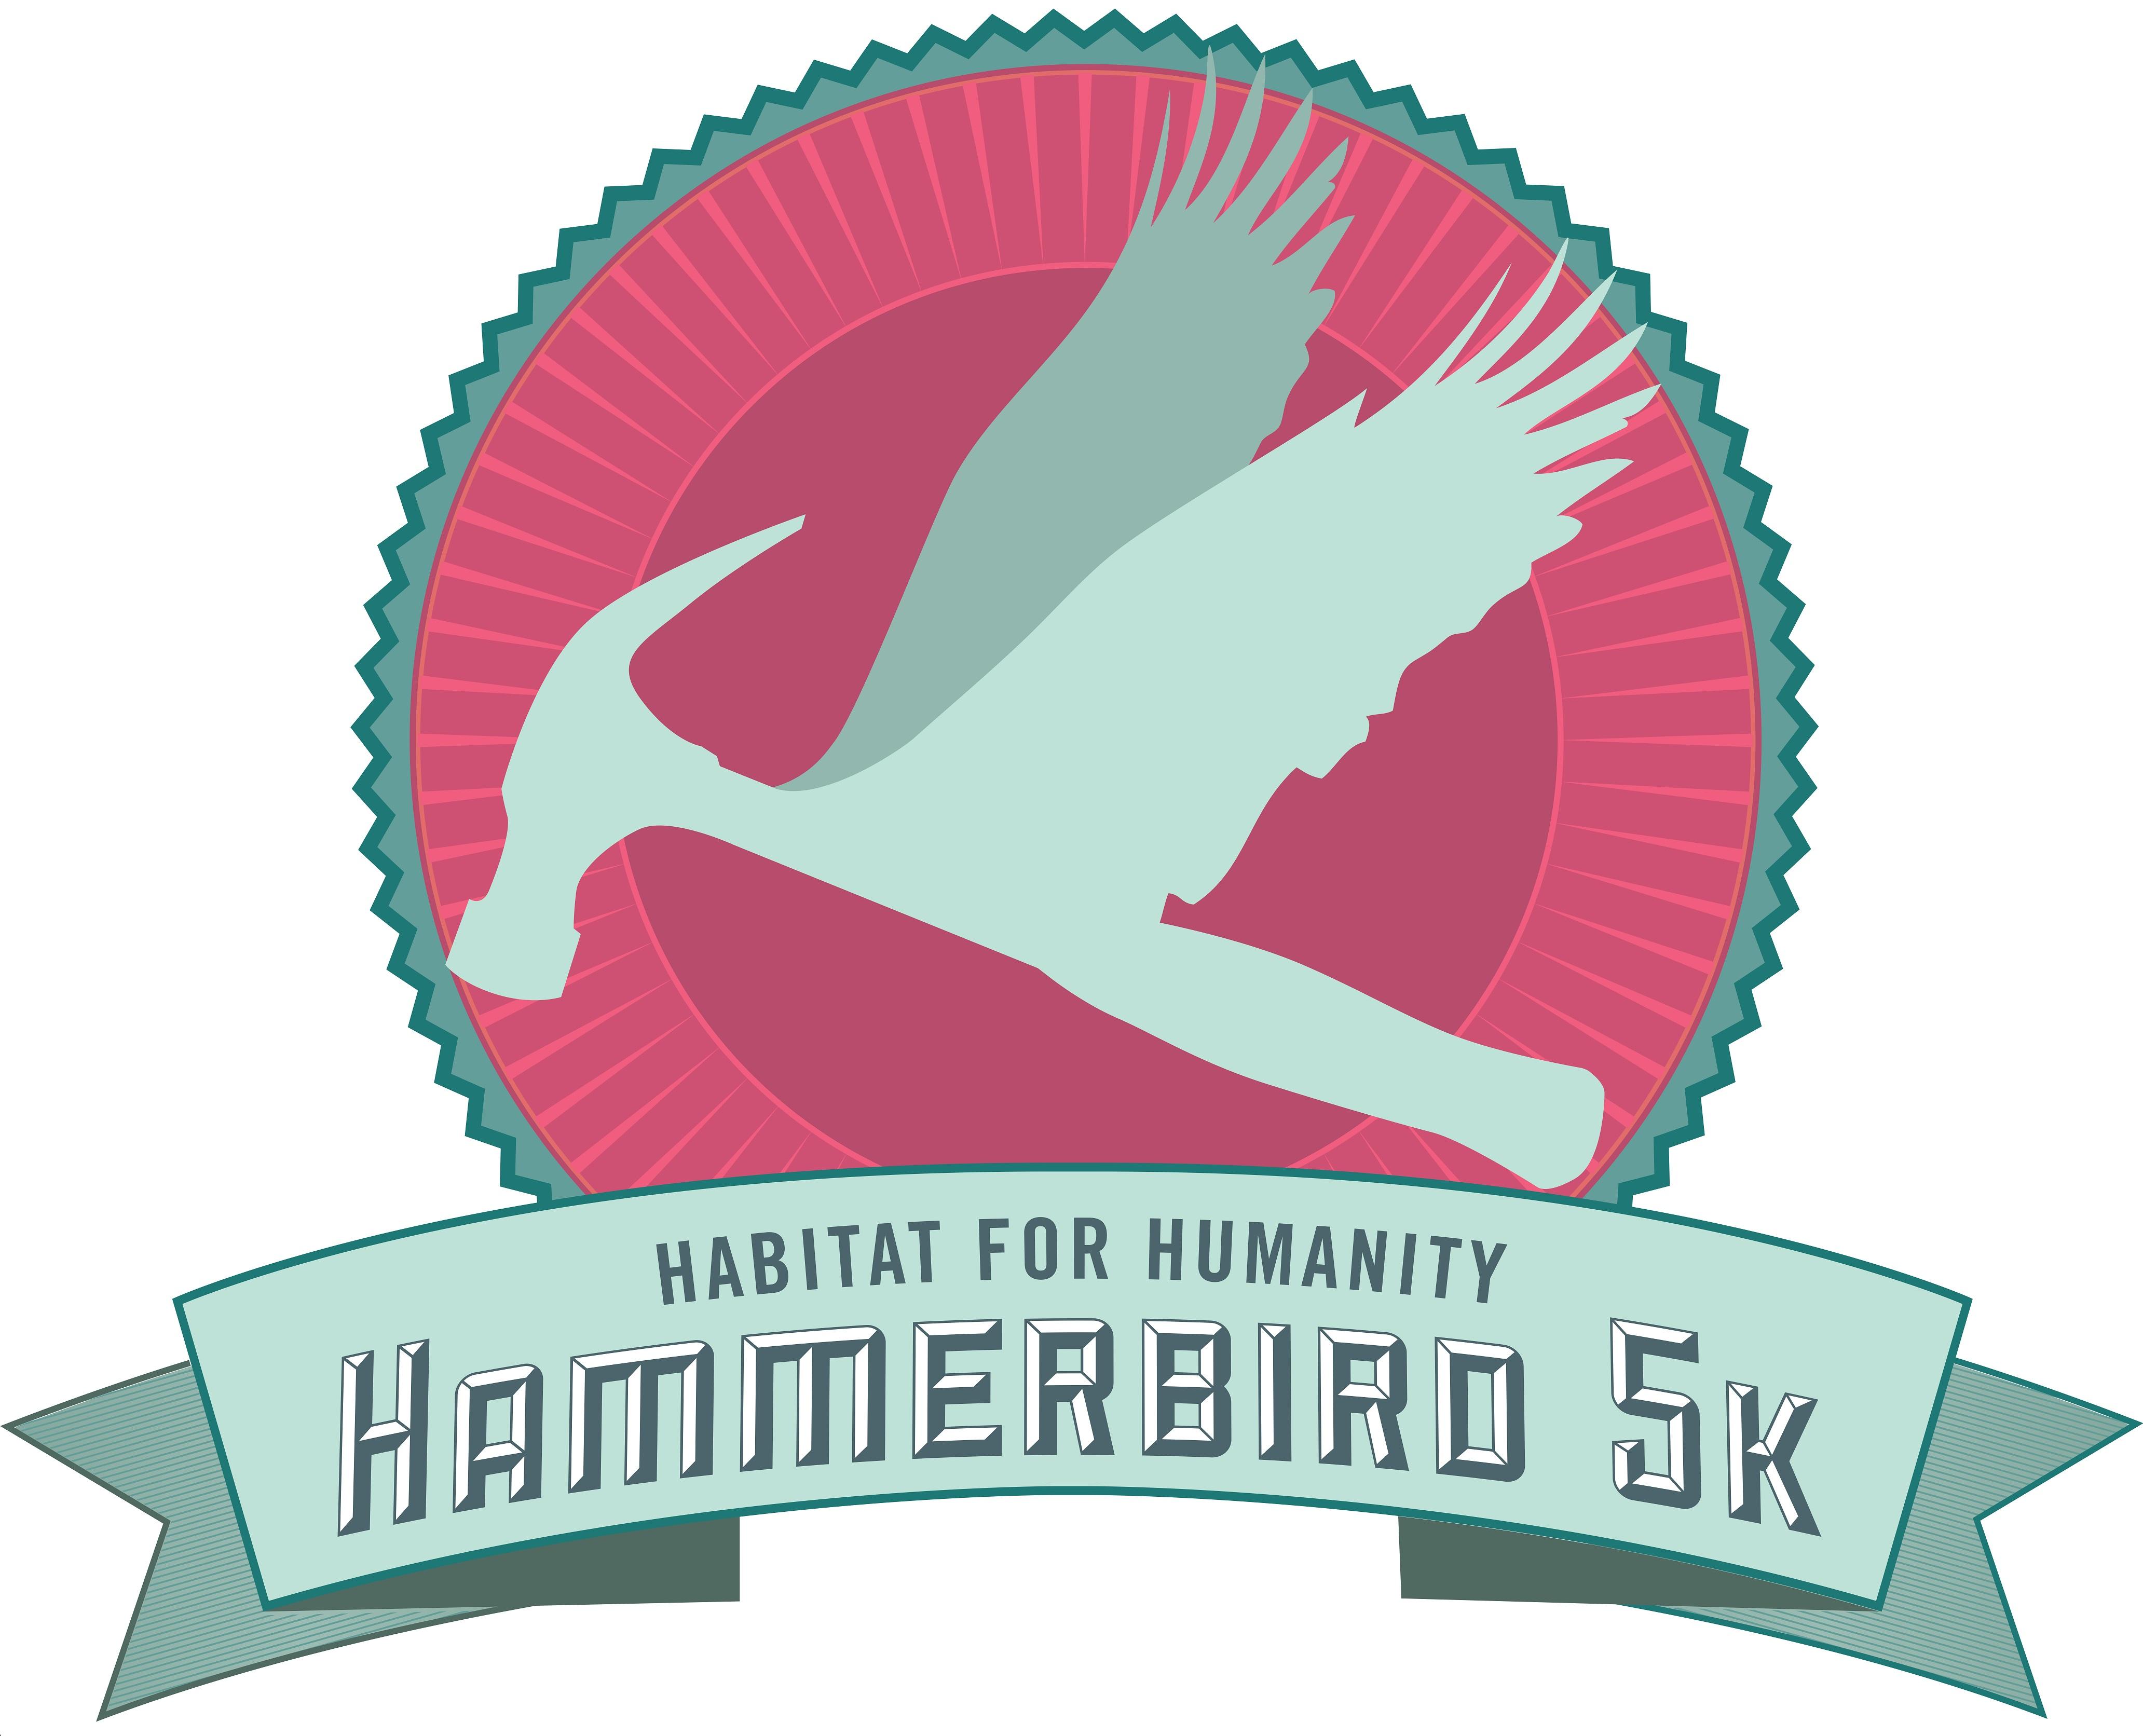 Hammerbird 5K